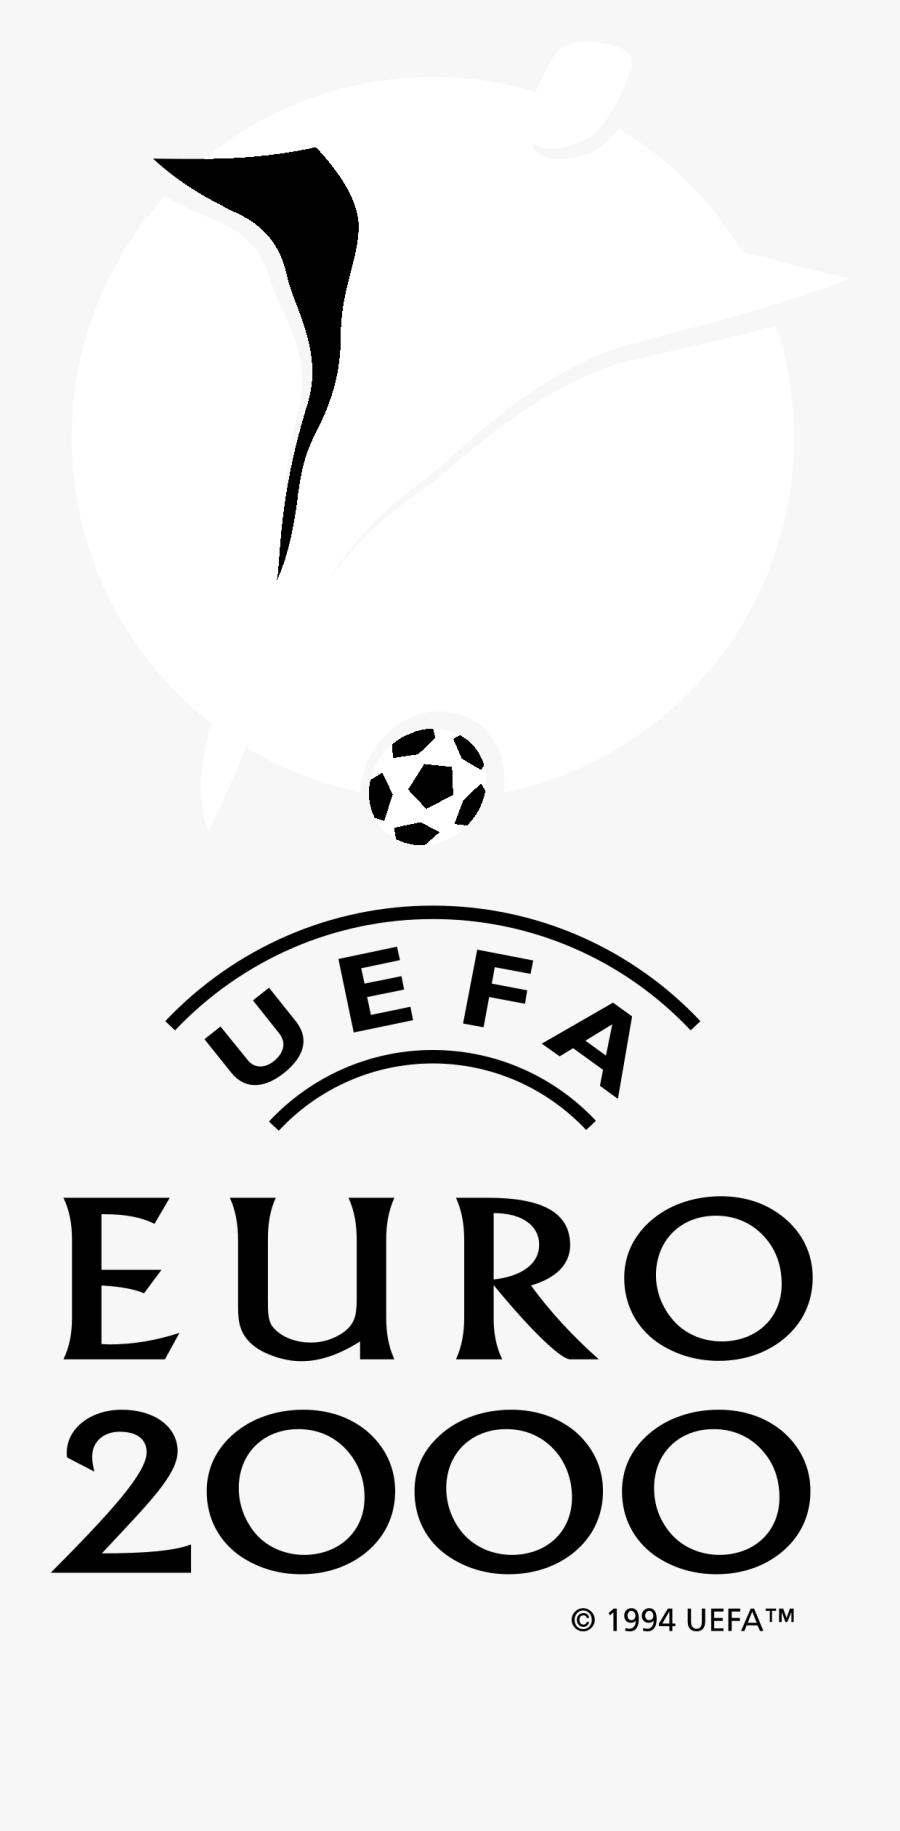 Uefa Euro 2000 Logo Black And White - Uefa Euro 2000, Transparent Clipart